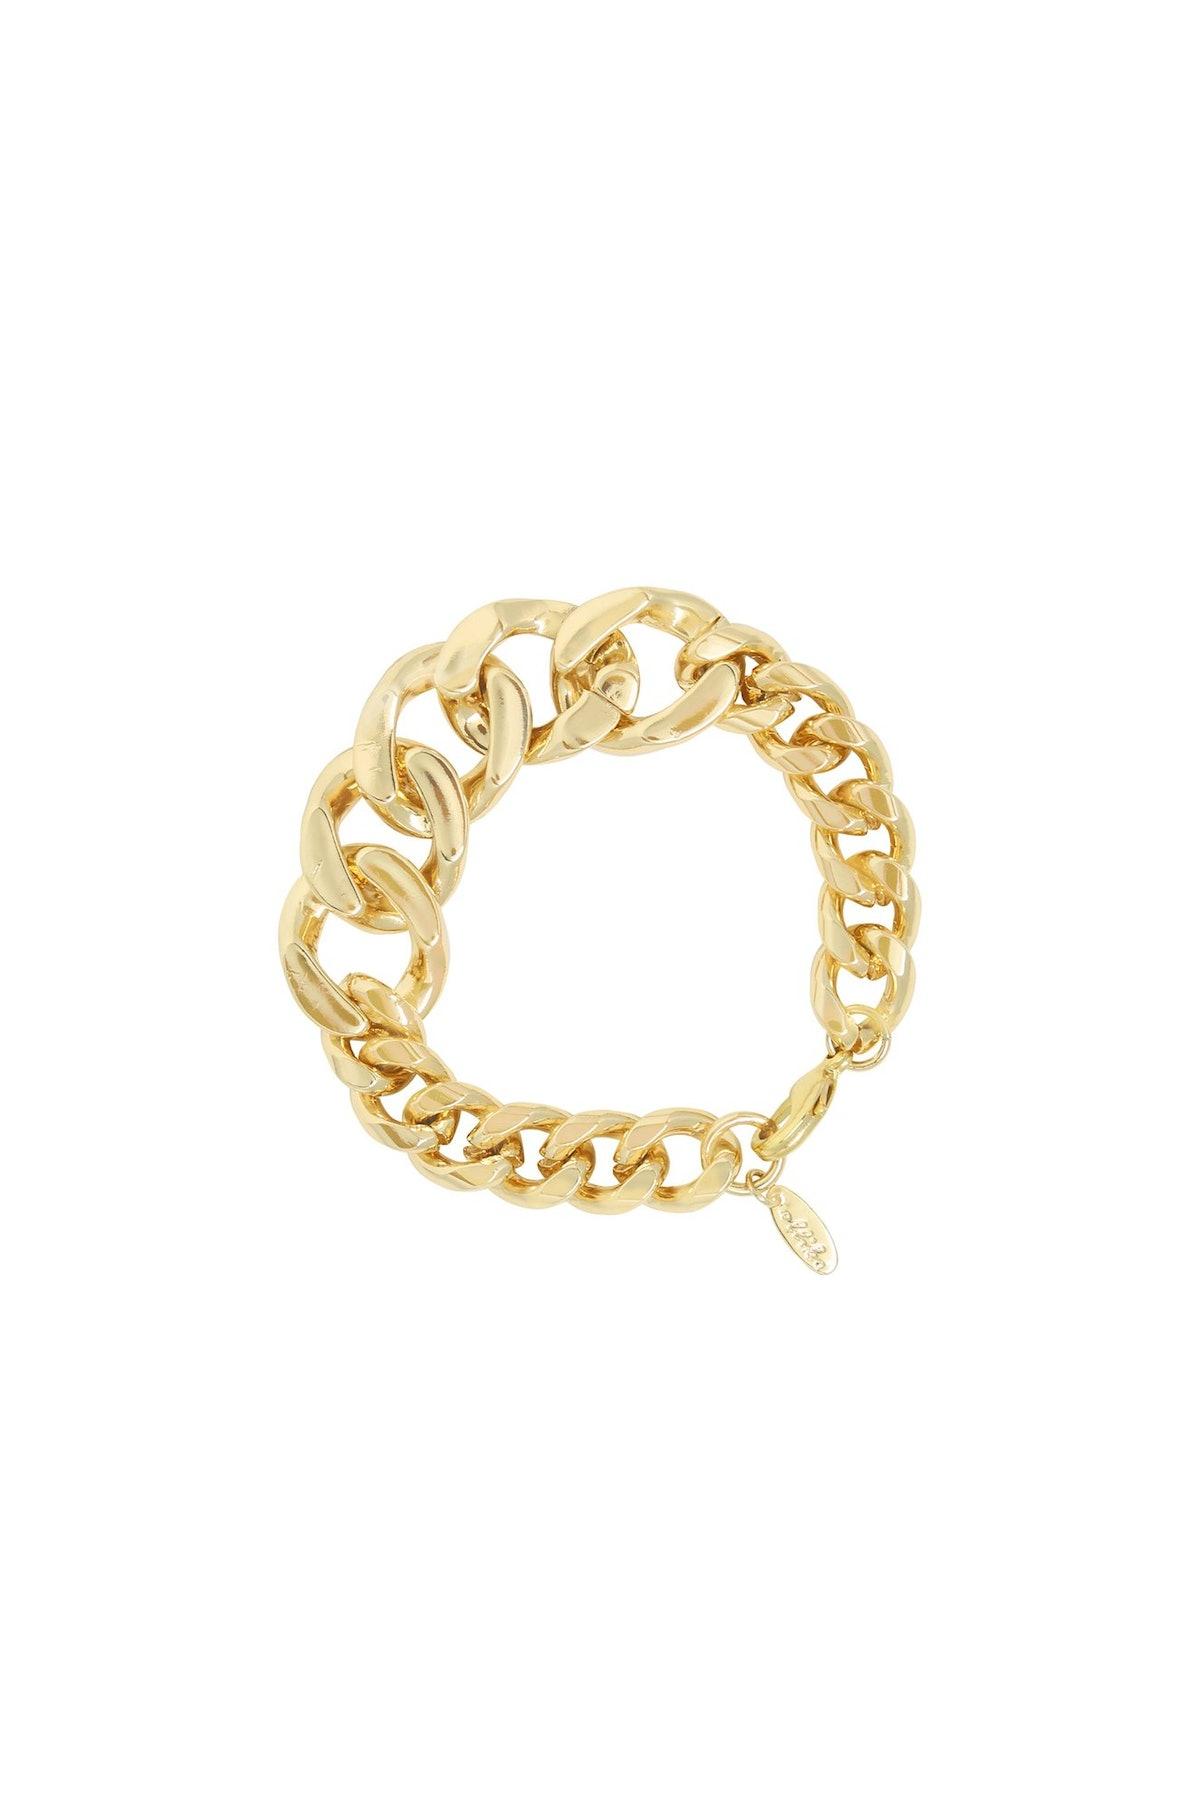 Big, Bad, and Bold Chain Link Bracelet